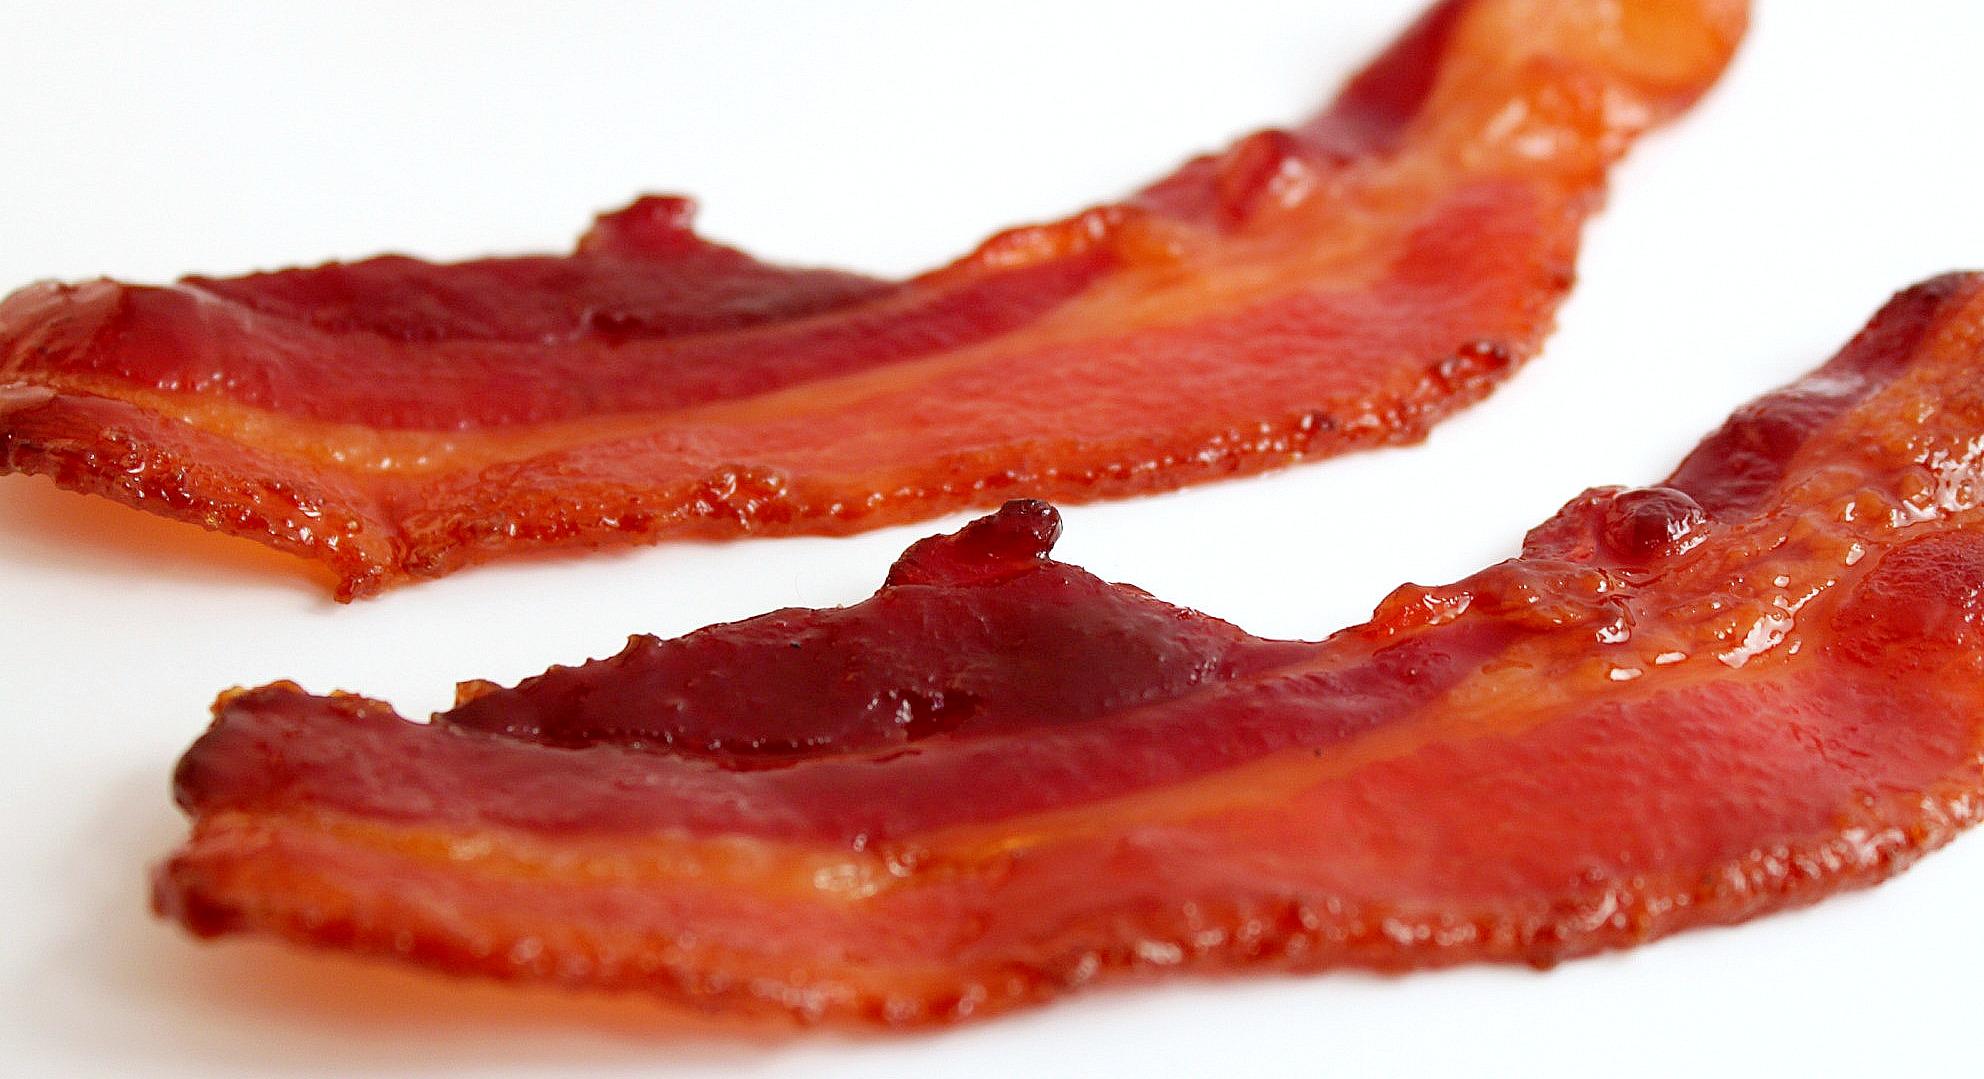 Can You Eat Bacon When Pregnant?